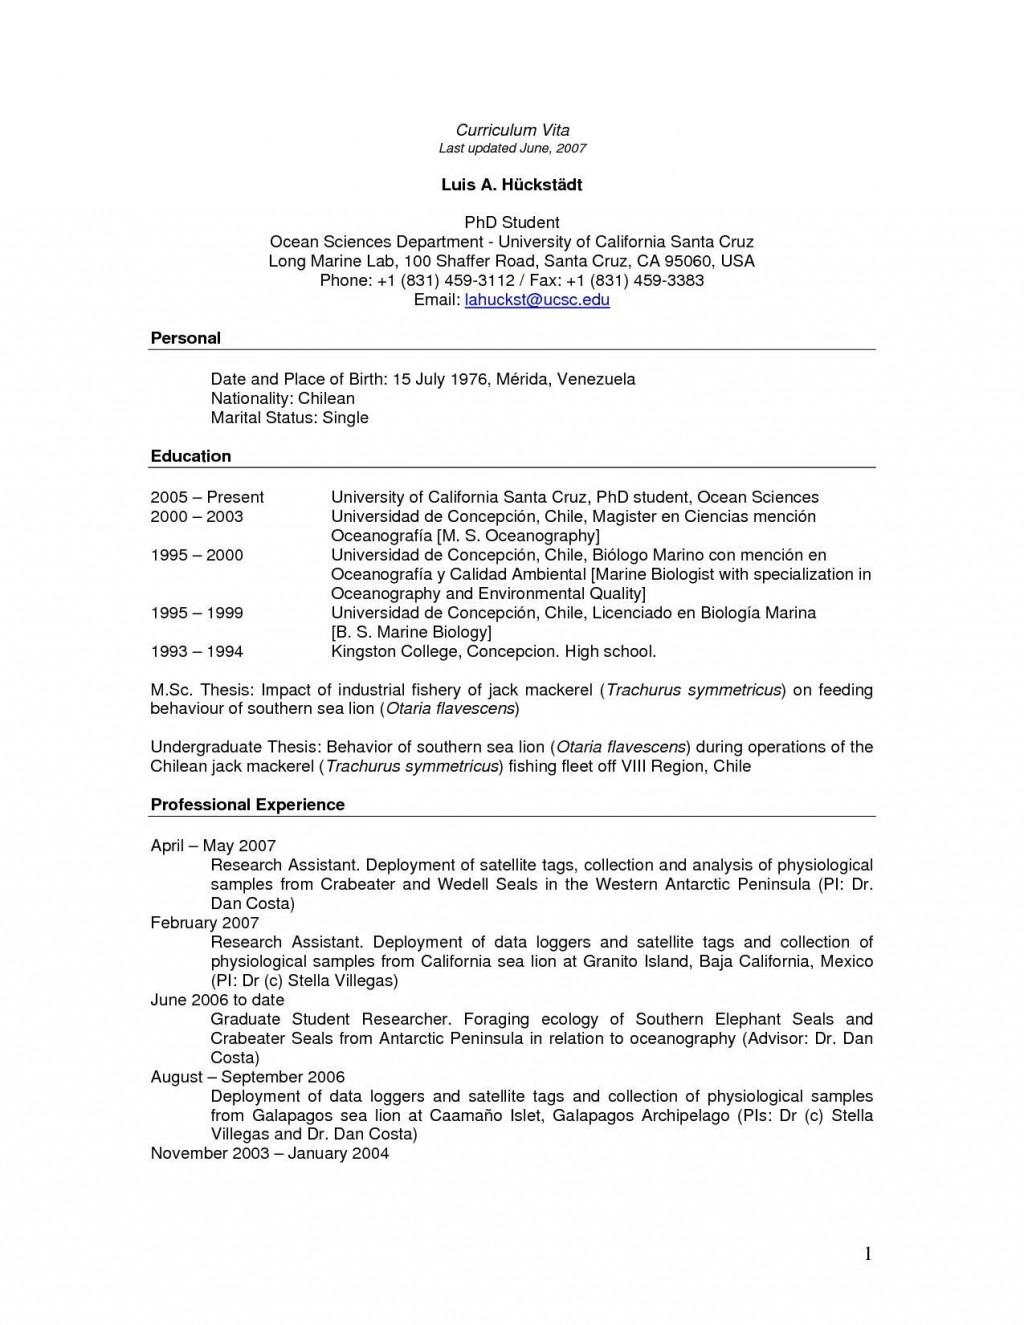 005 Remarkable Graduate School Curriculum Vitae Template Photo  For Application Resume FormatLarge